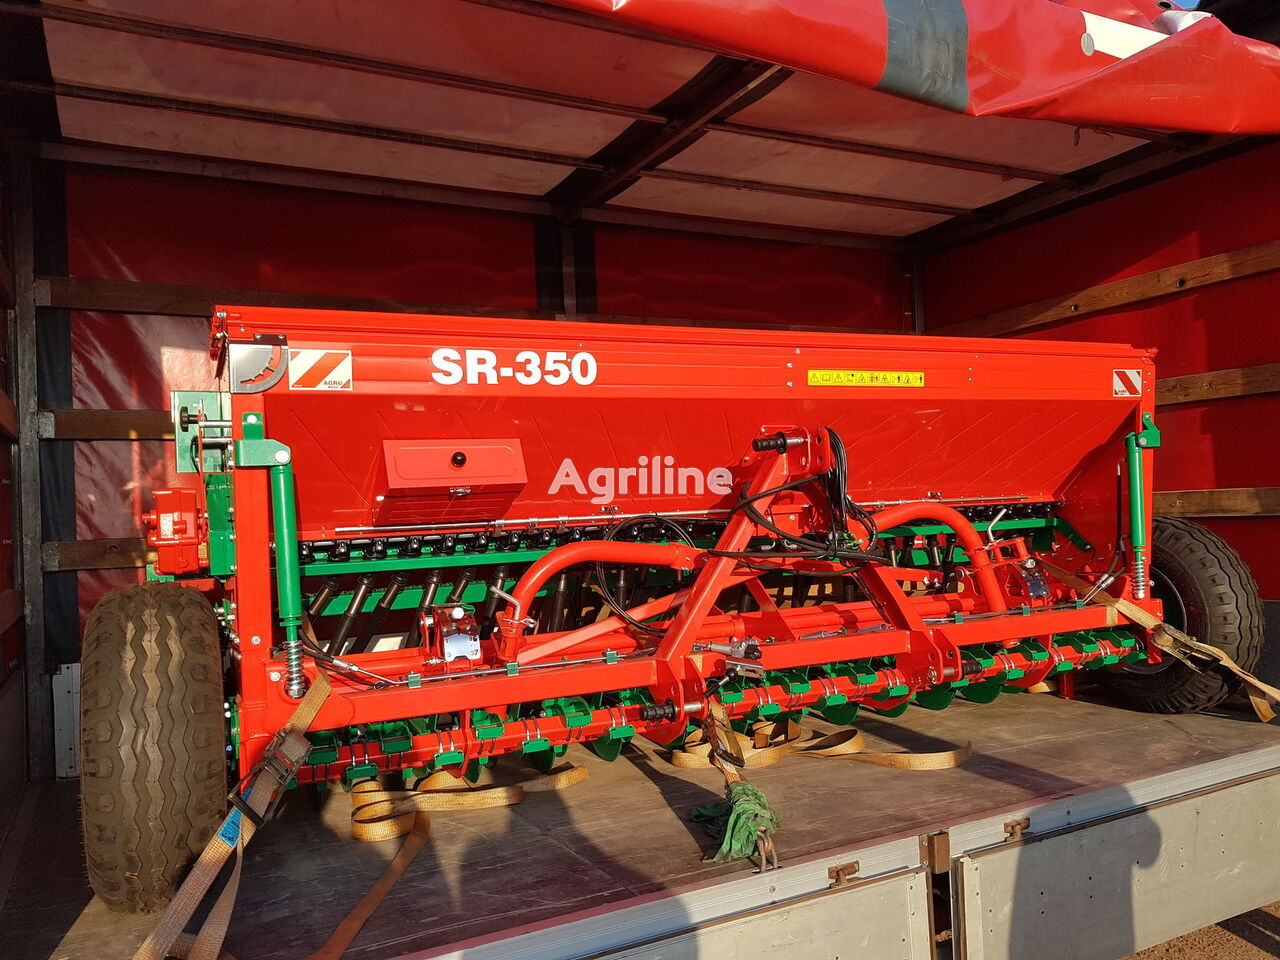 AGRO-MASZ Sivalka mehanichna nova SR350II GARANTIYa 1 RIK! sembradora mecánica nueva